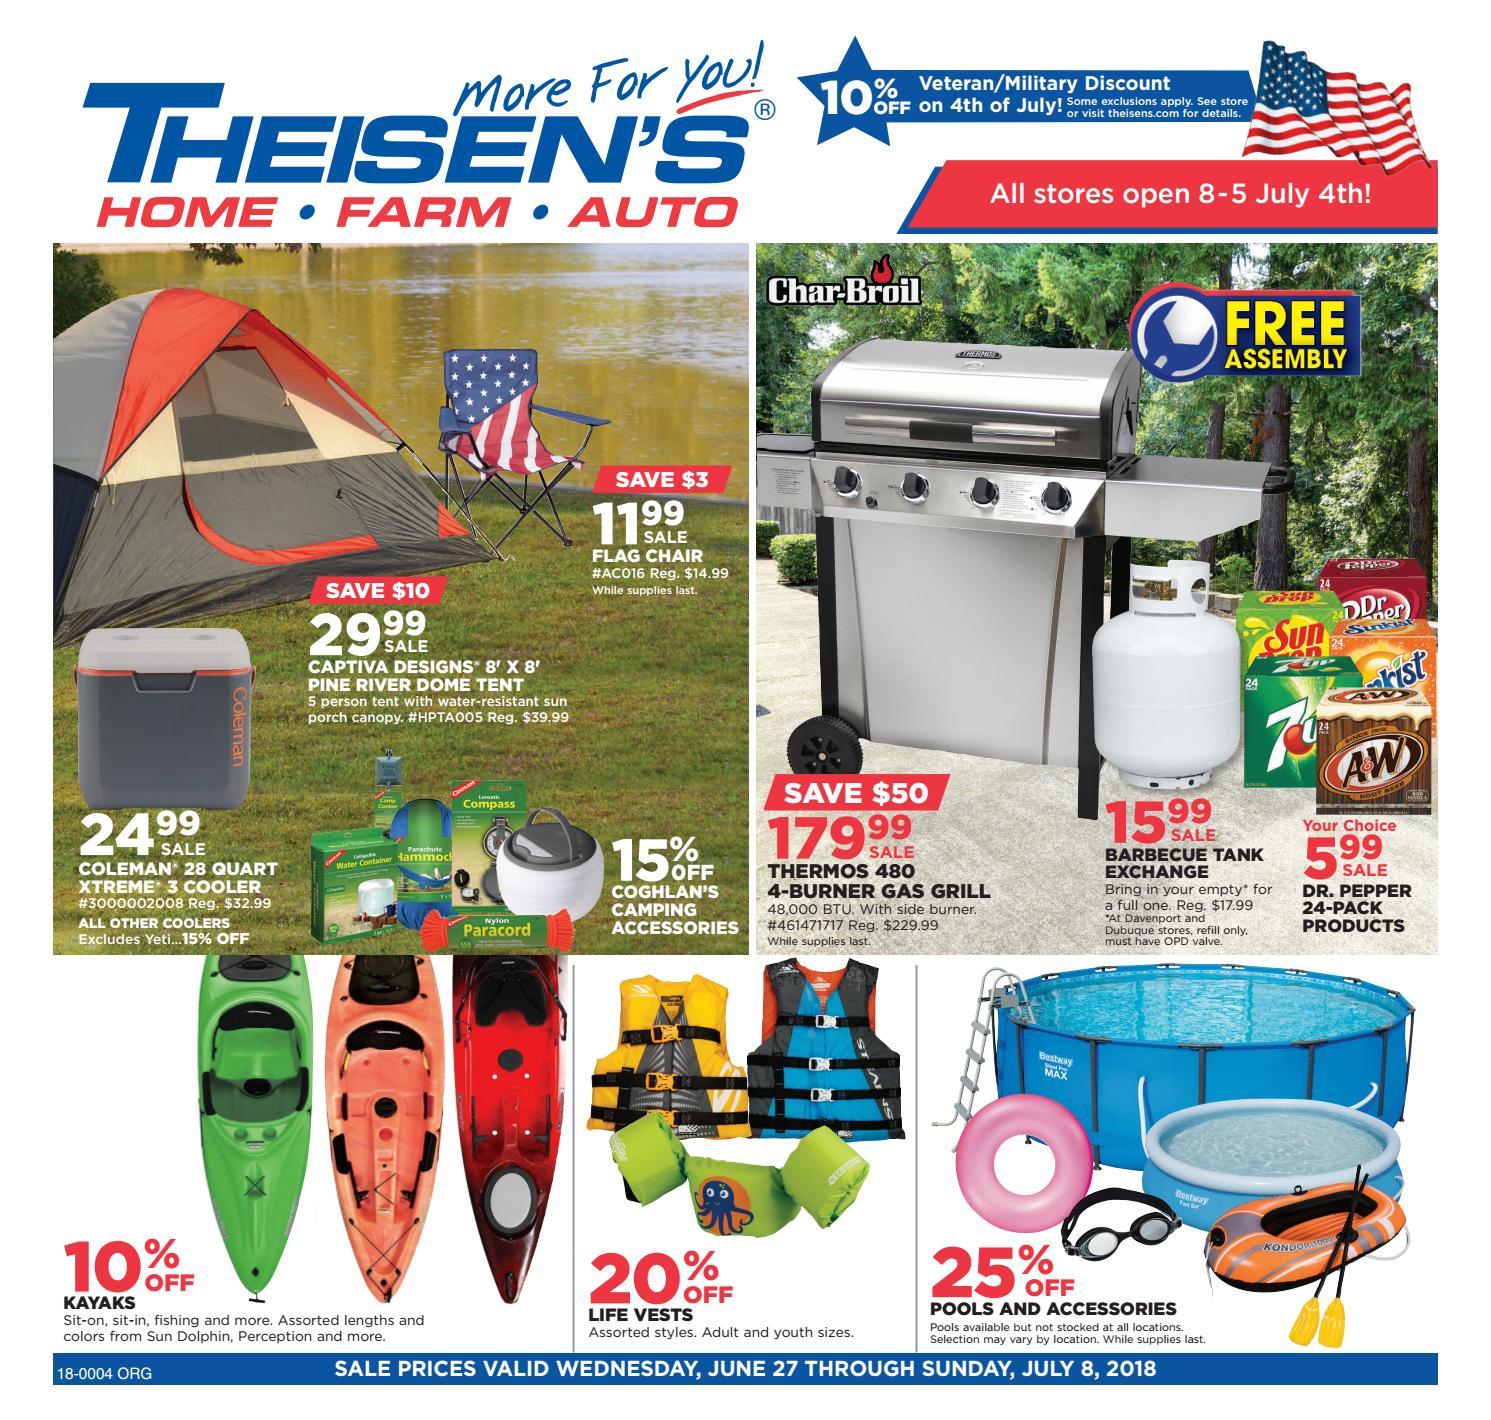 June 27 2018 by theisens - issuu